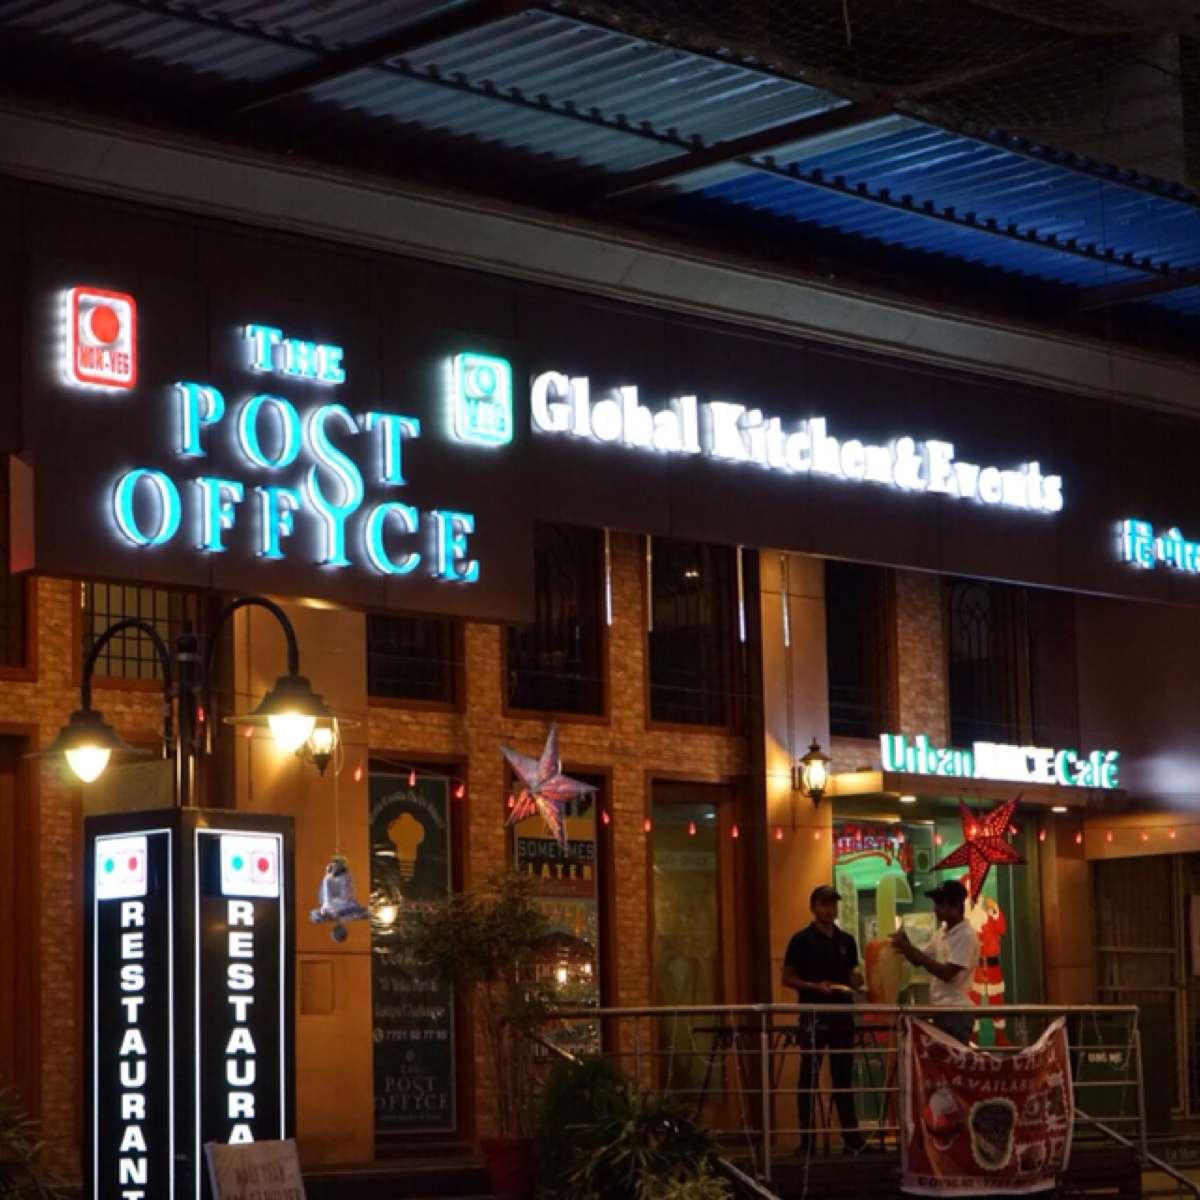 The Post Office Virar Palghar Menu Photos Images And